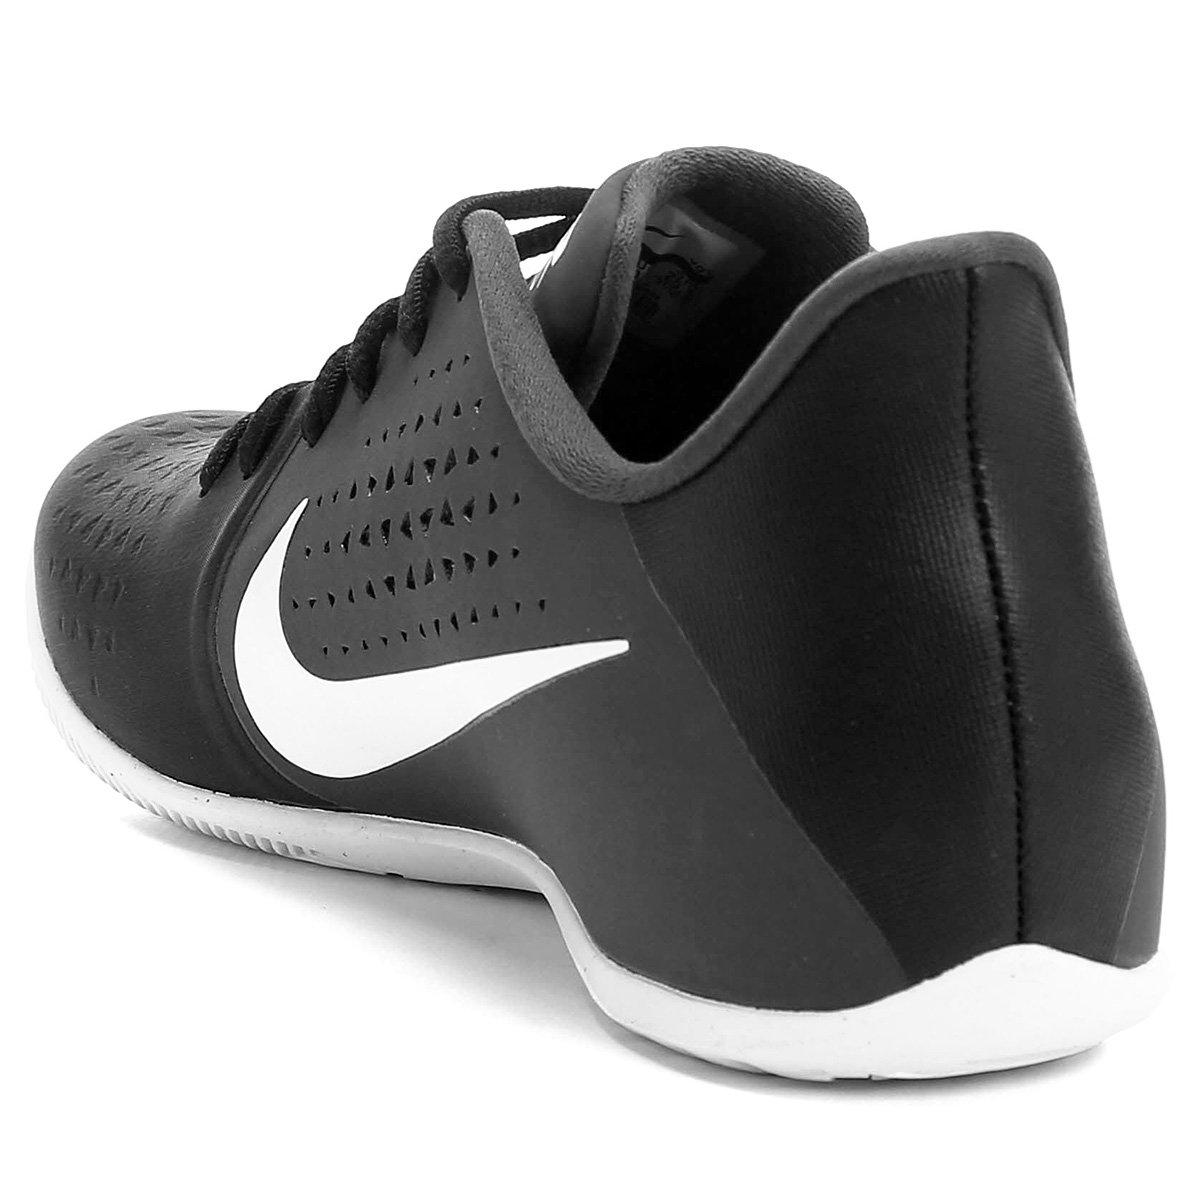 Tênis Nike Air Behold Low Masculino - Preto e Branco - Compre Agora ... 3d36b7f05e17c